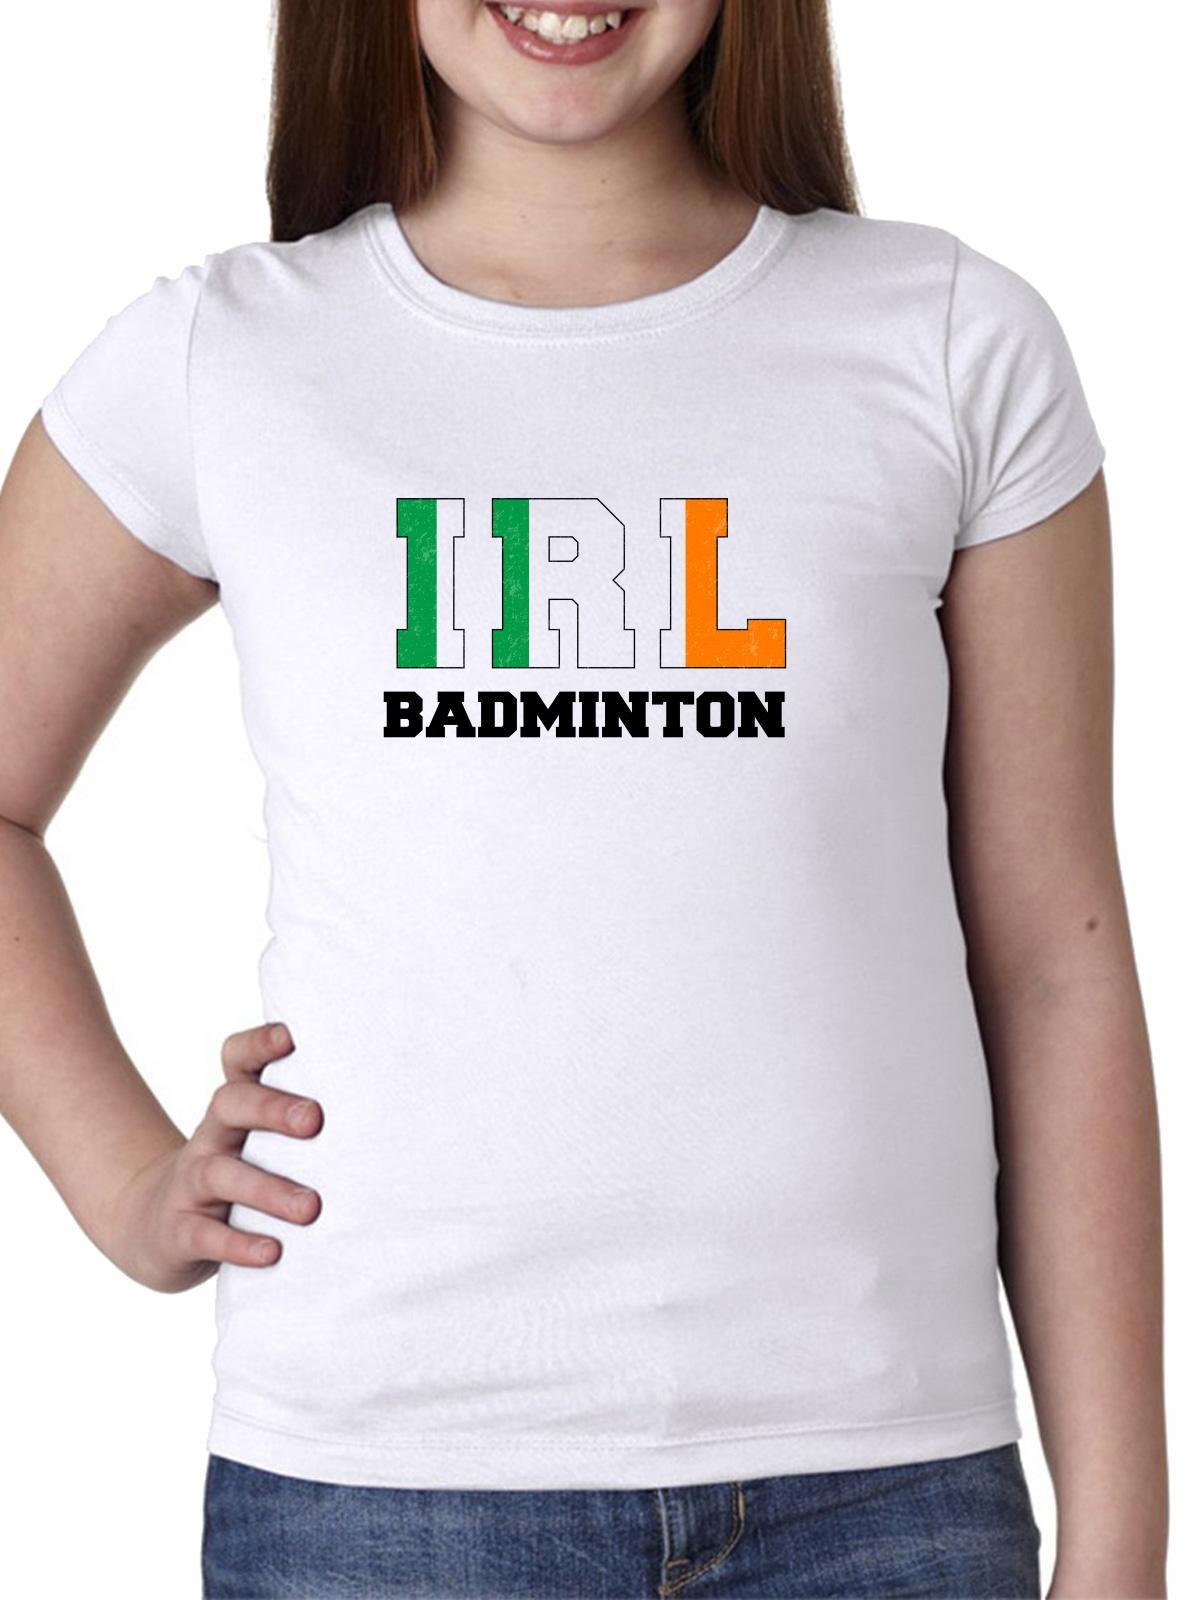 Ireland Badminton - Olympic Games - Rio - Flag Girl's Cotton Youth T-Shirt